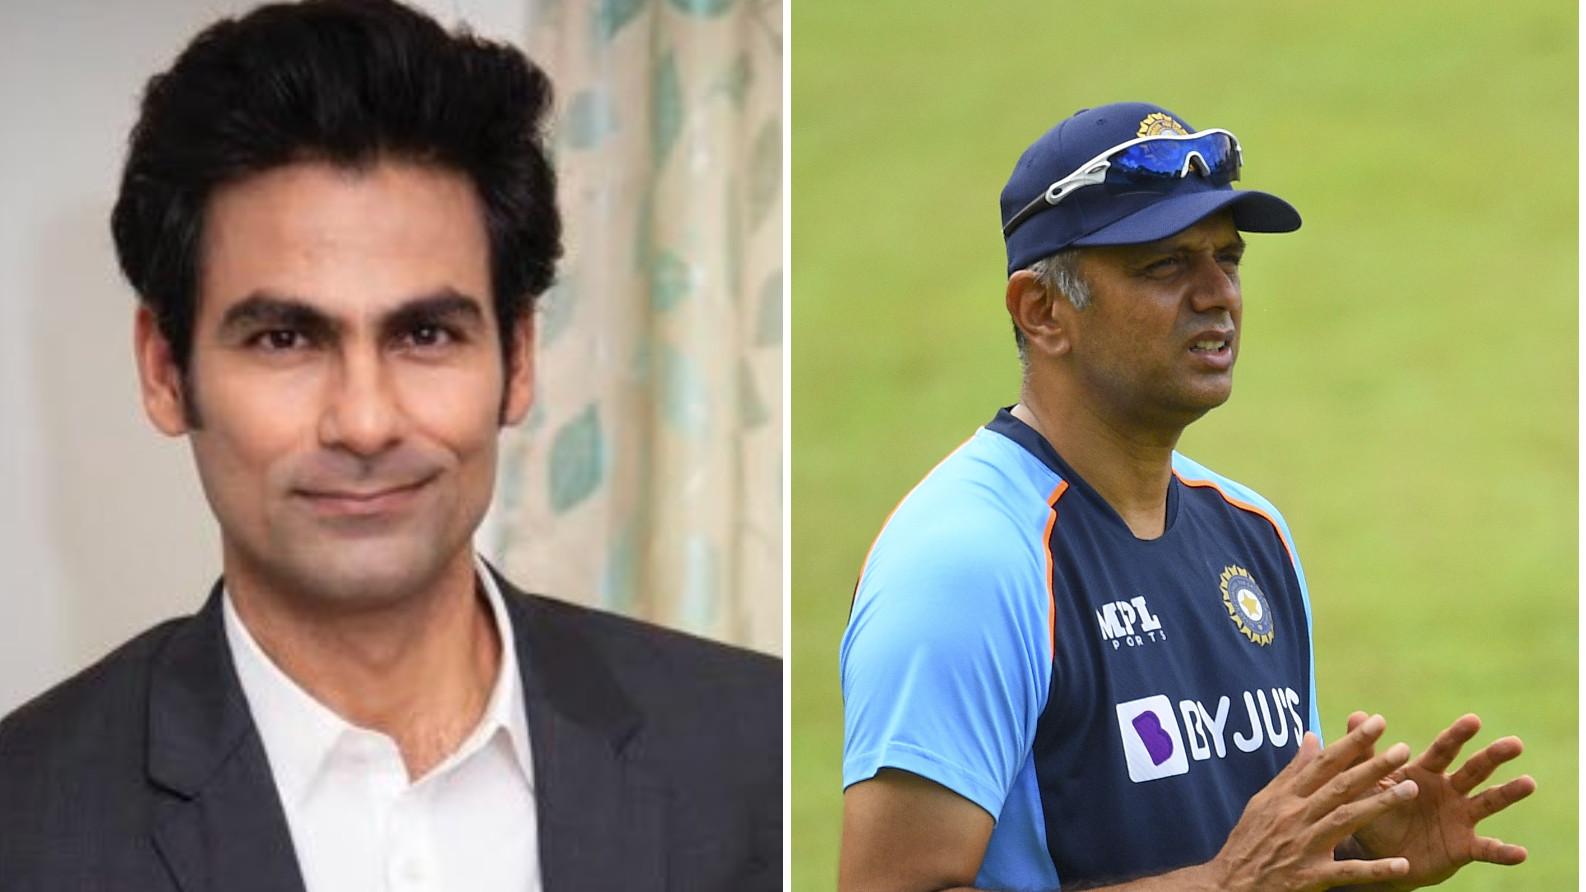 SL v IND 2021: Rahul Dravid should pick the best possible India XI against Sri Lanka, says Mohammad Kaif